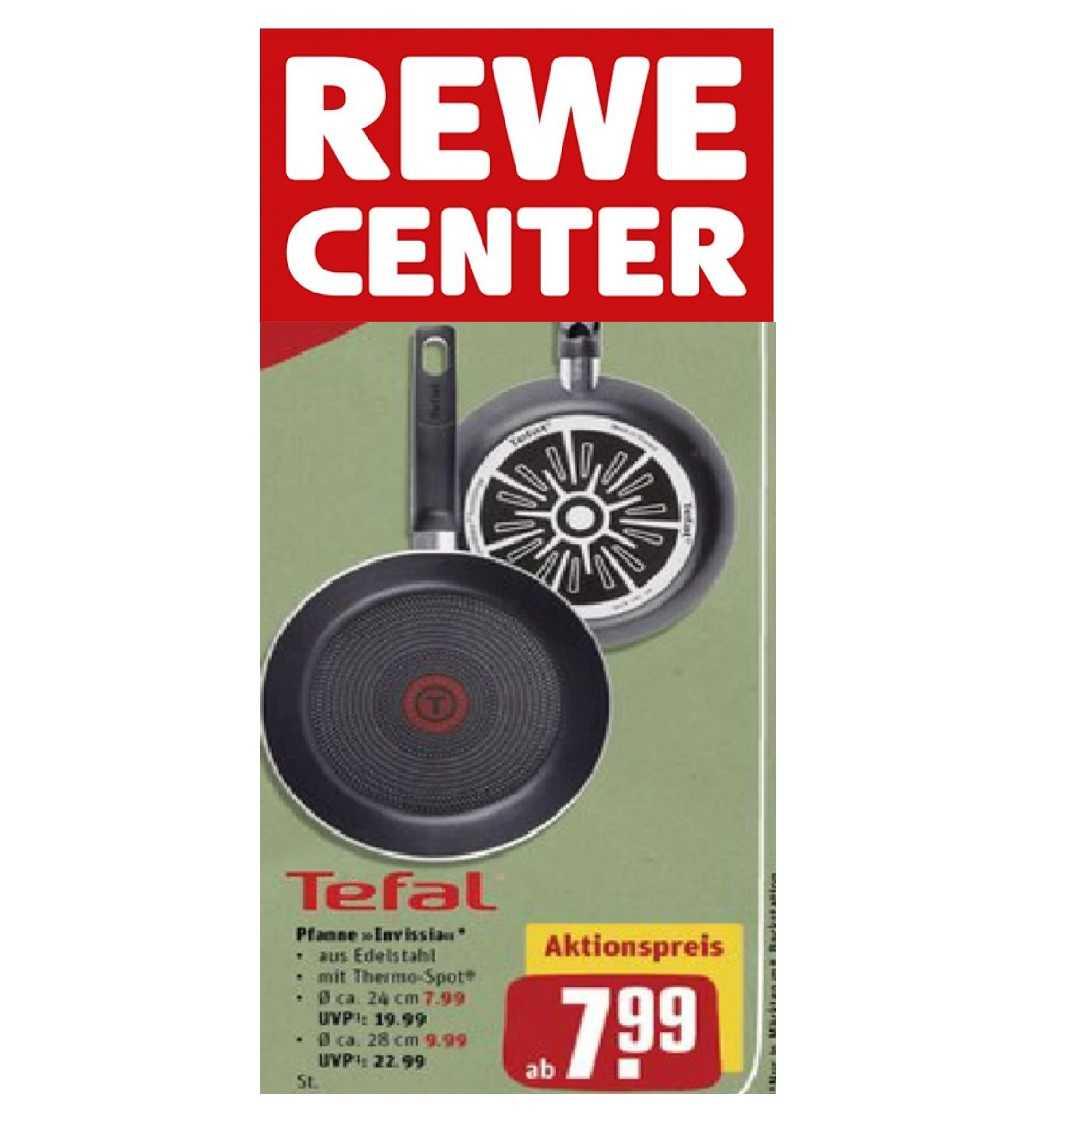 (Offline) Rewe-Center: Tefal Invissia Pfannen ab 24 cm